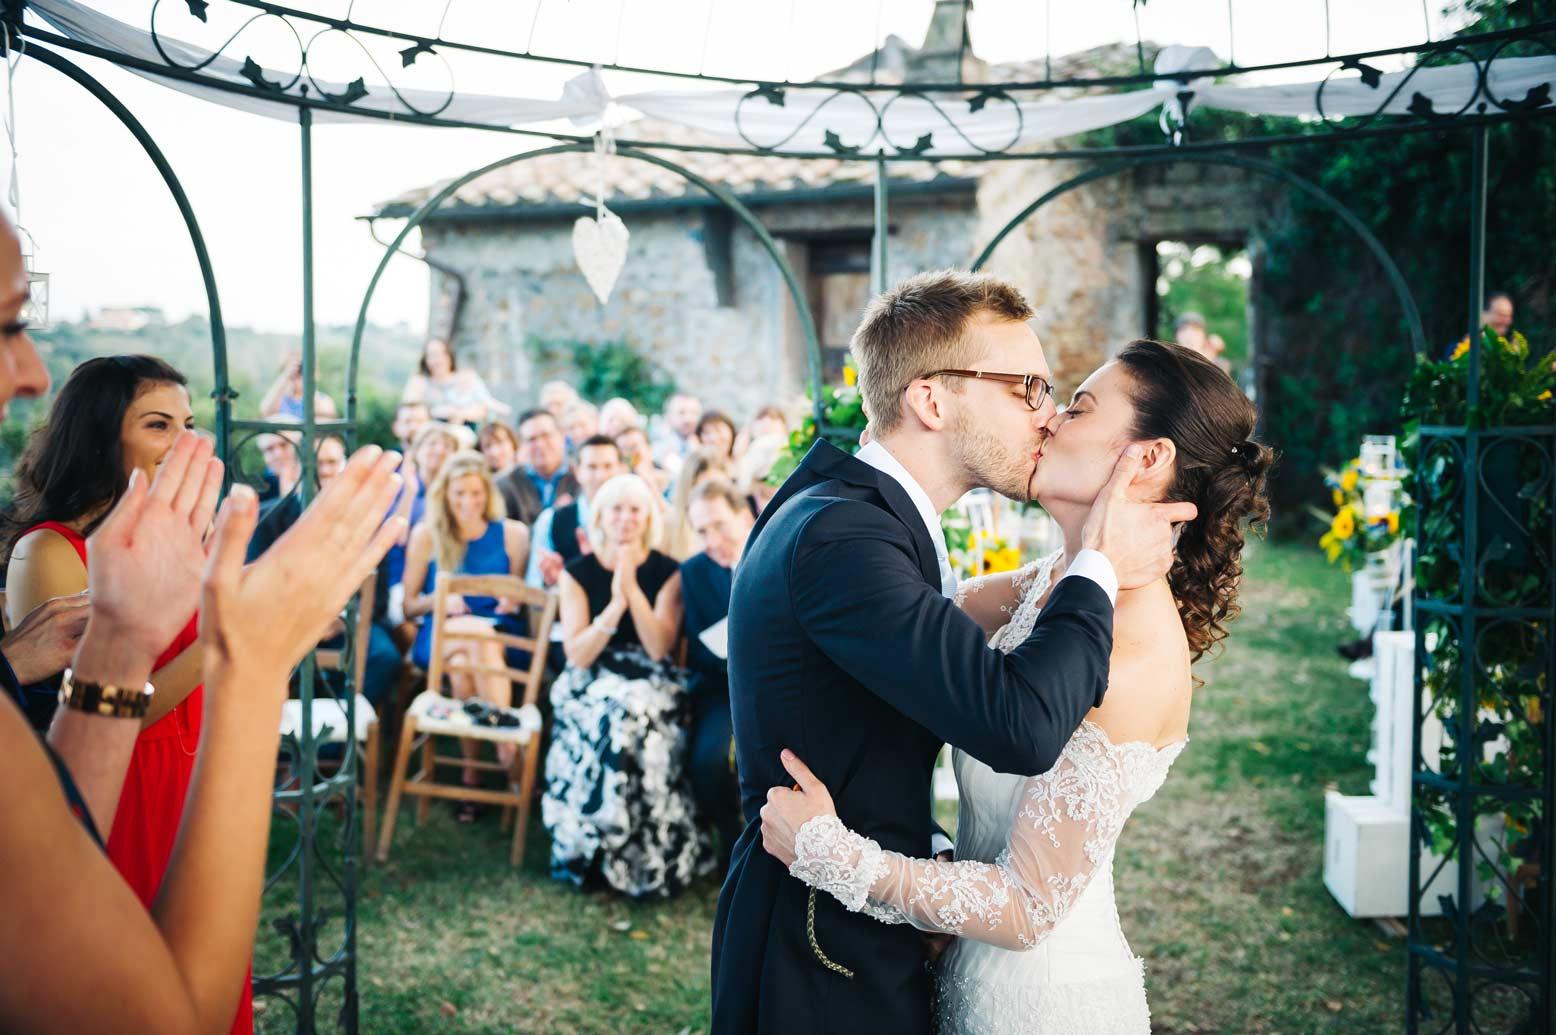 Wedding-Photographer-in-Italy-Wedding-in-Rome-1-Ceremony